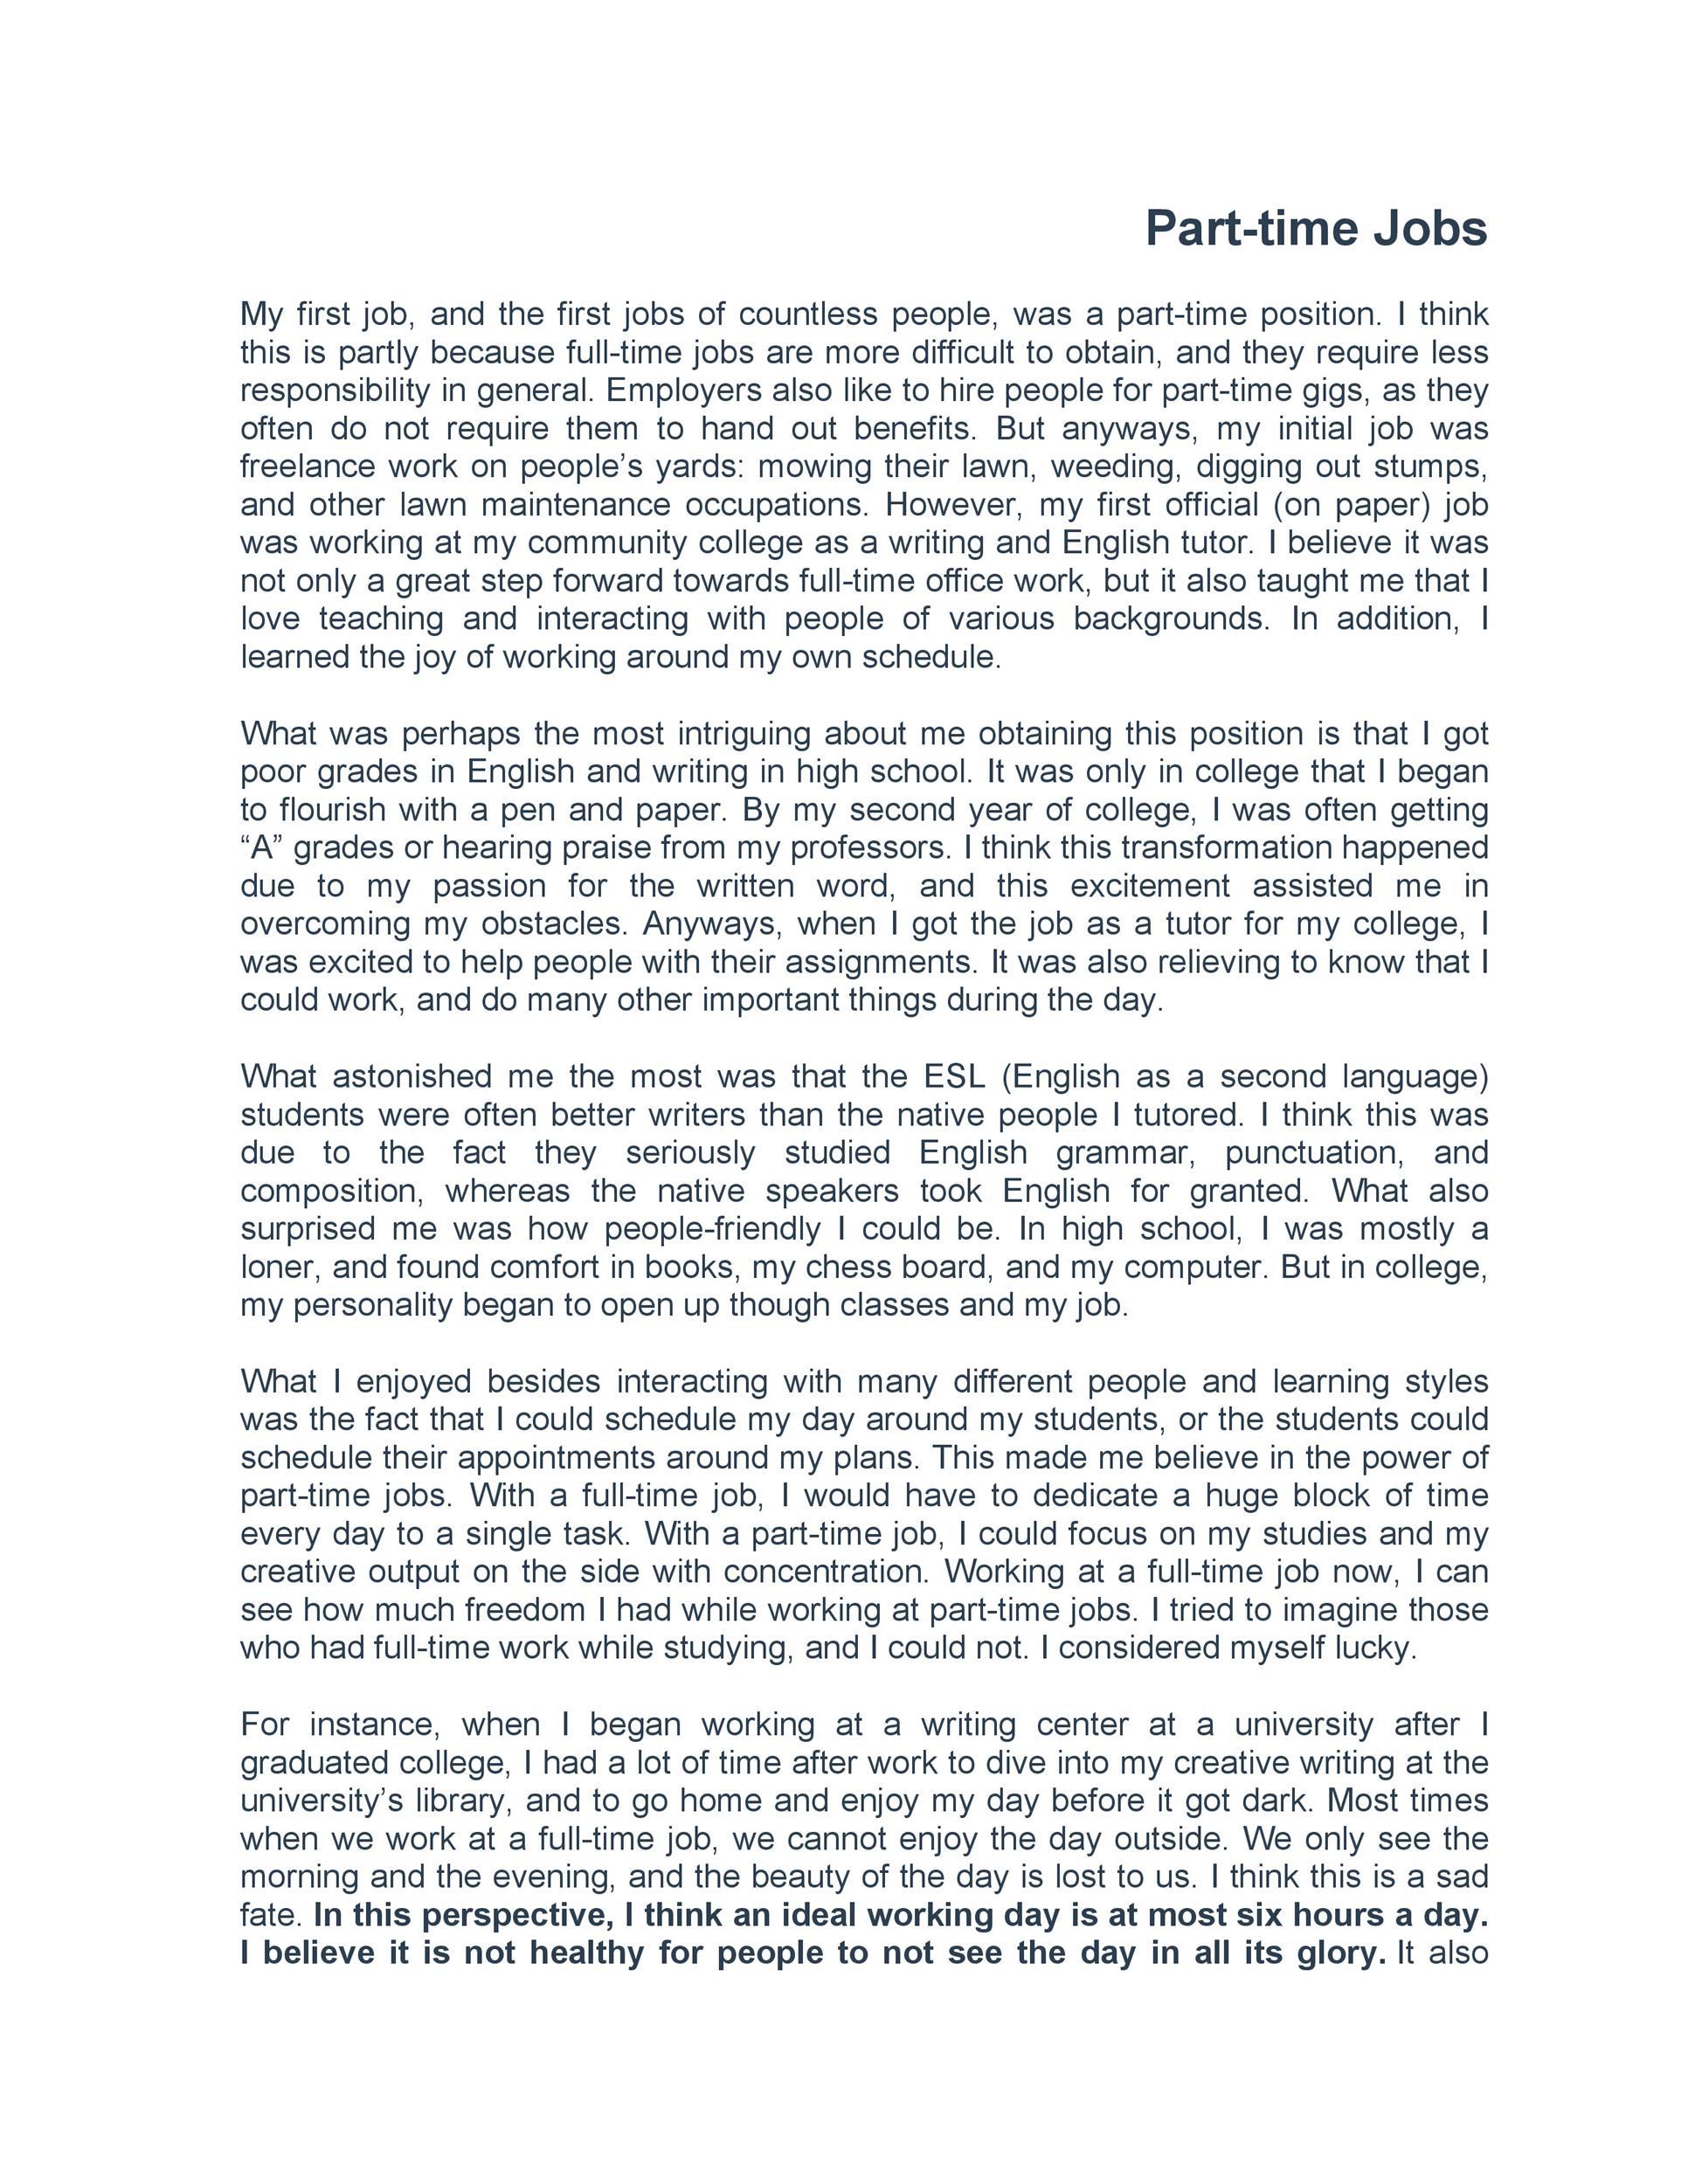 Free reflective essay example 49